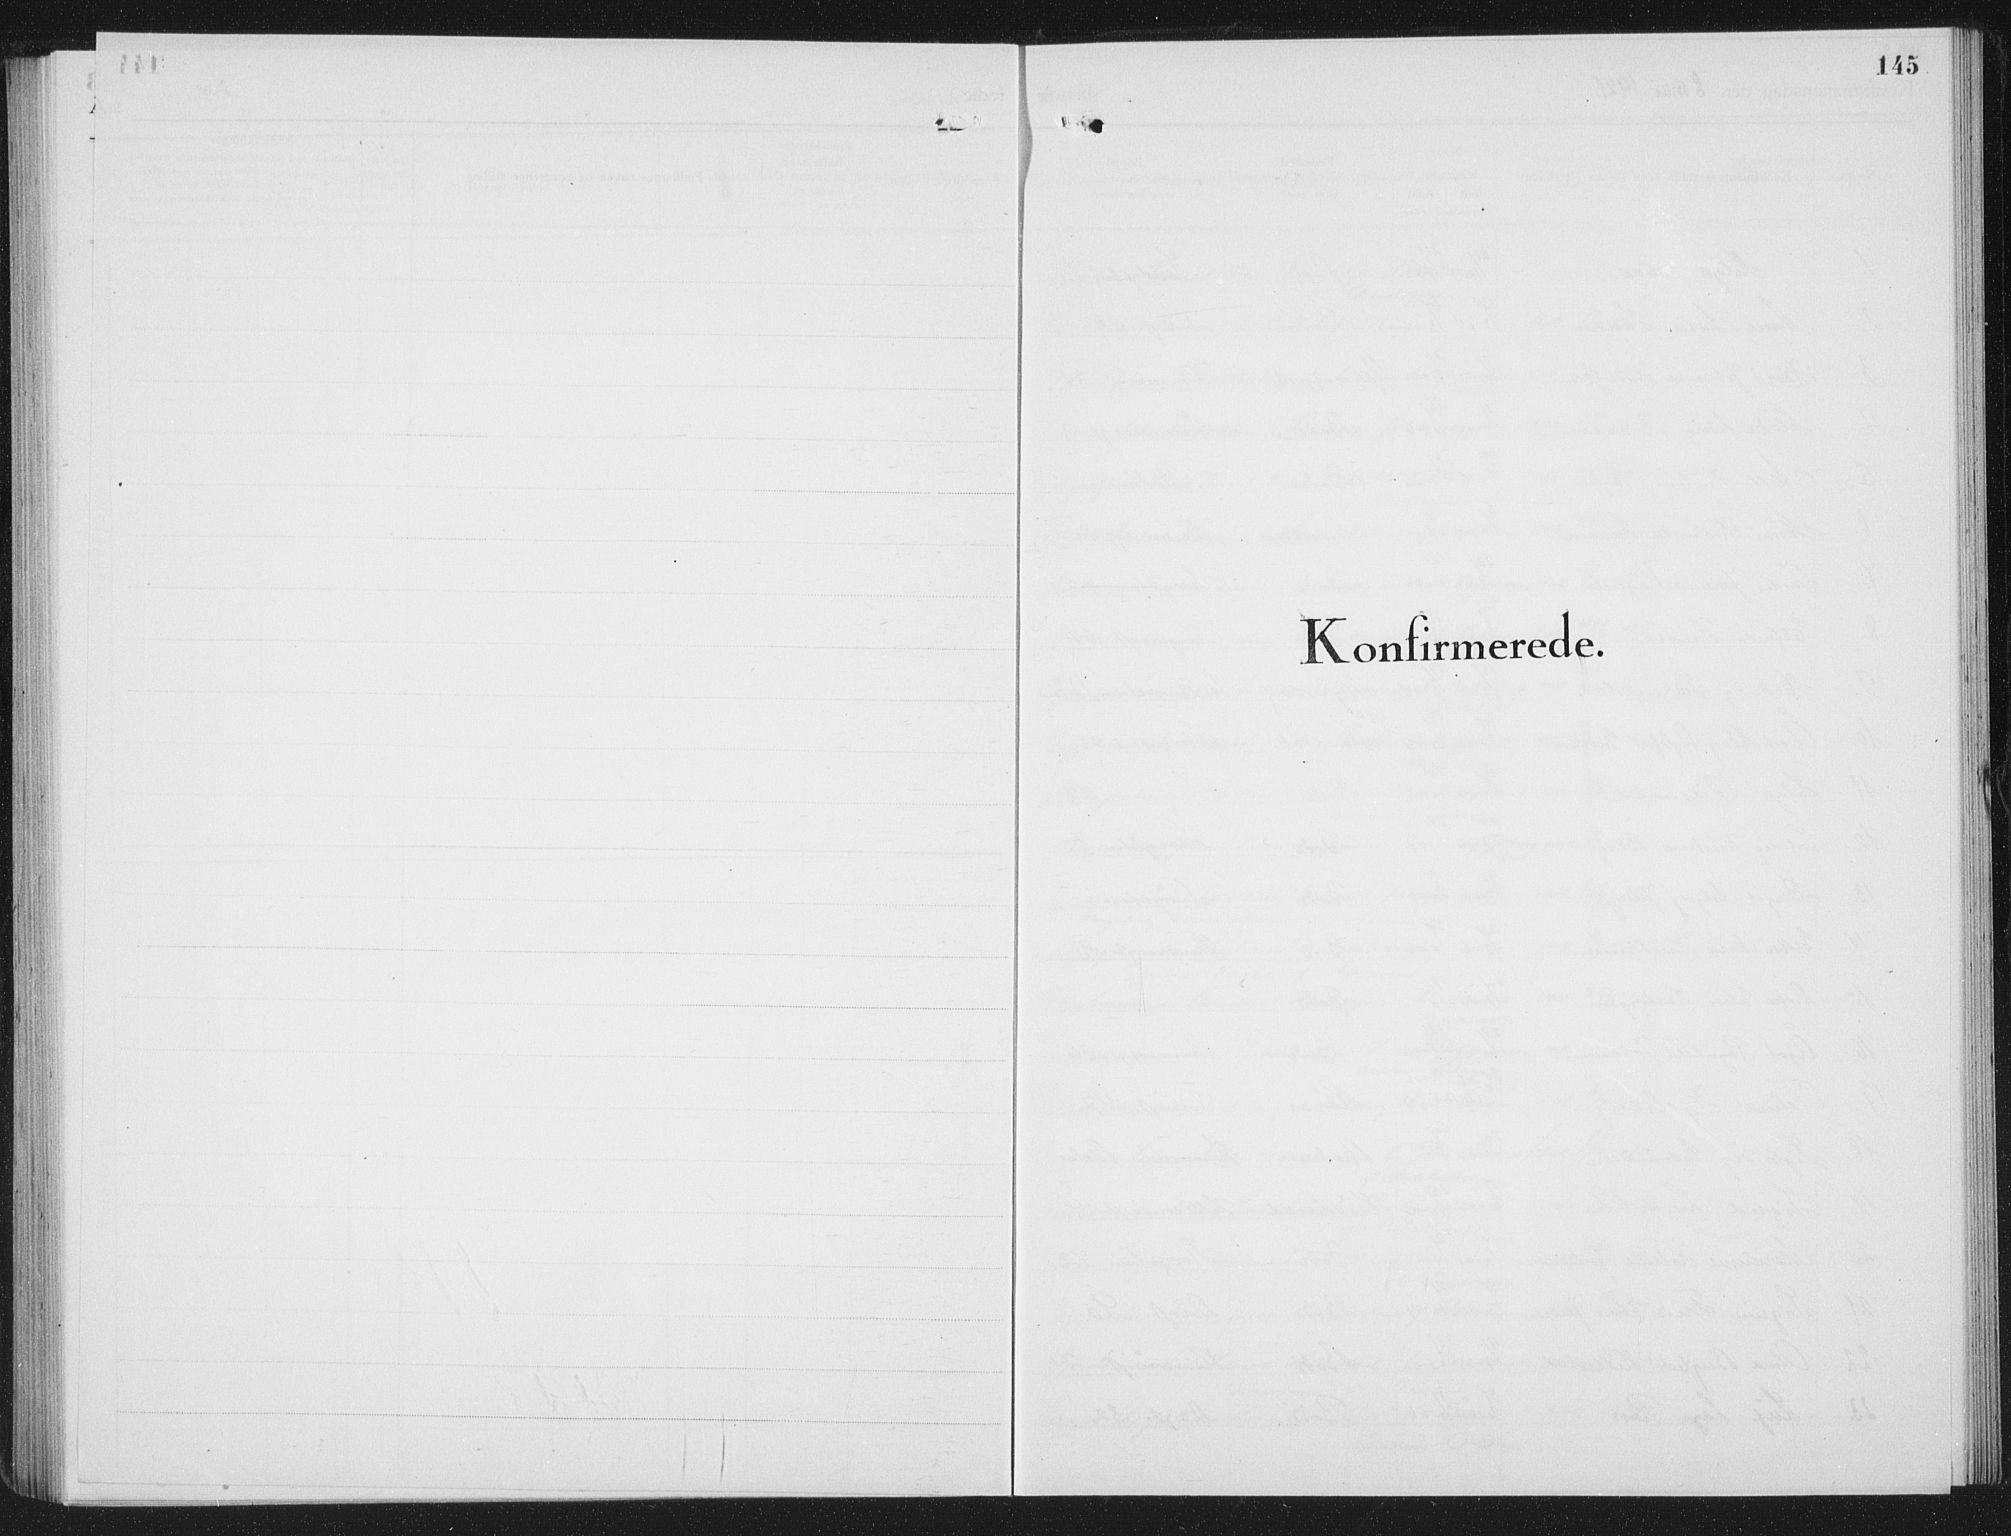 SAT, Ministerialprotokoller, klokkerbøker og fødselsregistre - Nordland, 801/L0037: Klokkerbok nr. 801C12, 1921-1937, s. 145